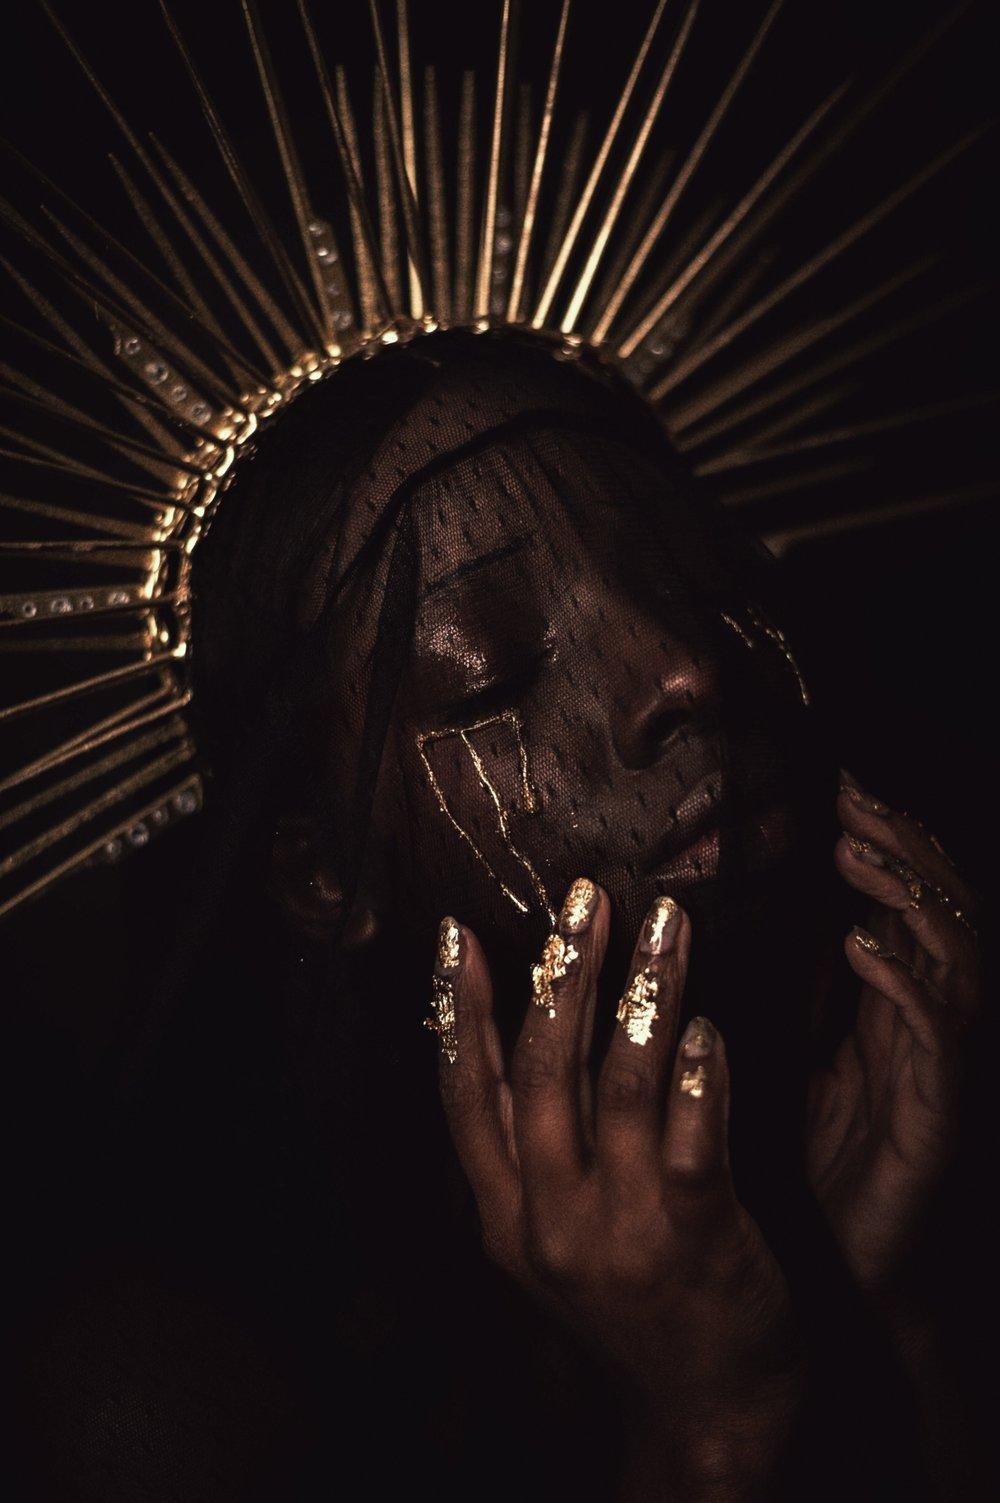 TheGlossier-TashaJames-Halloween-2018-Crying-Saint-Gold-Heavenly-Bodies11.JPG